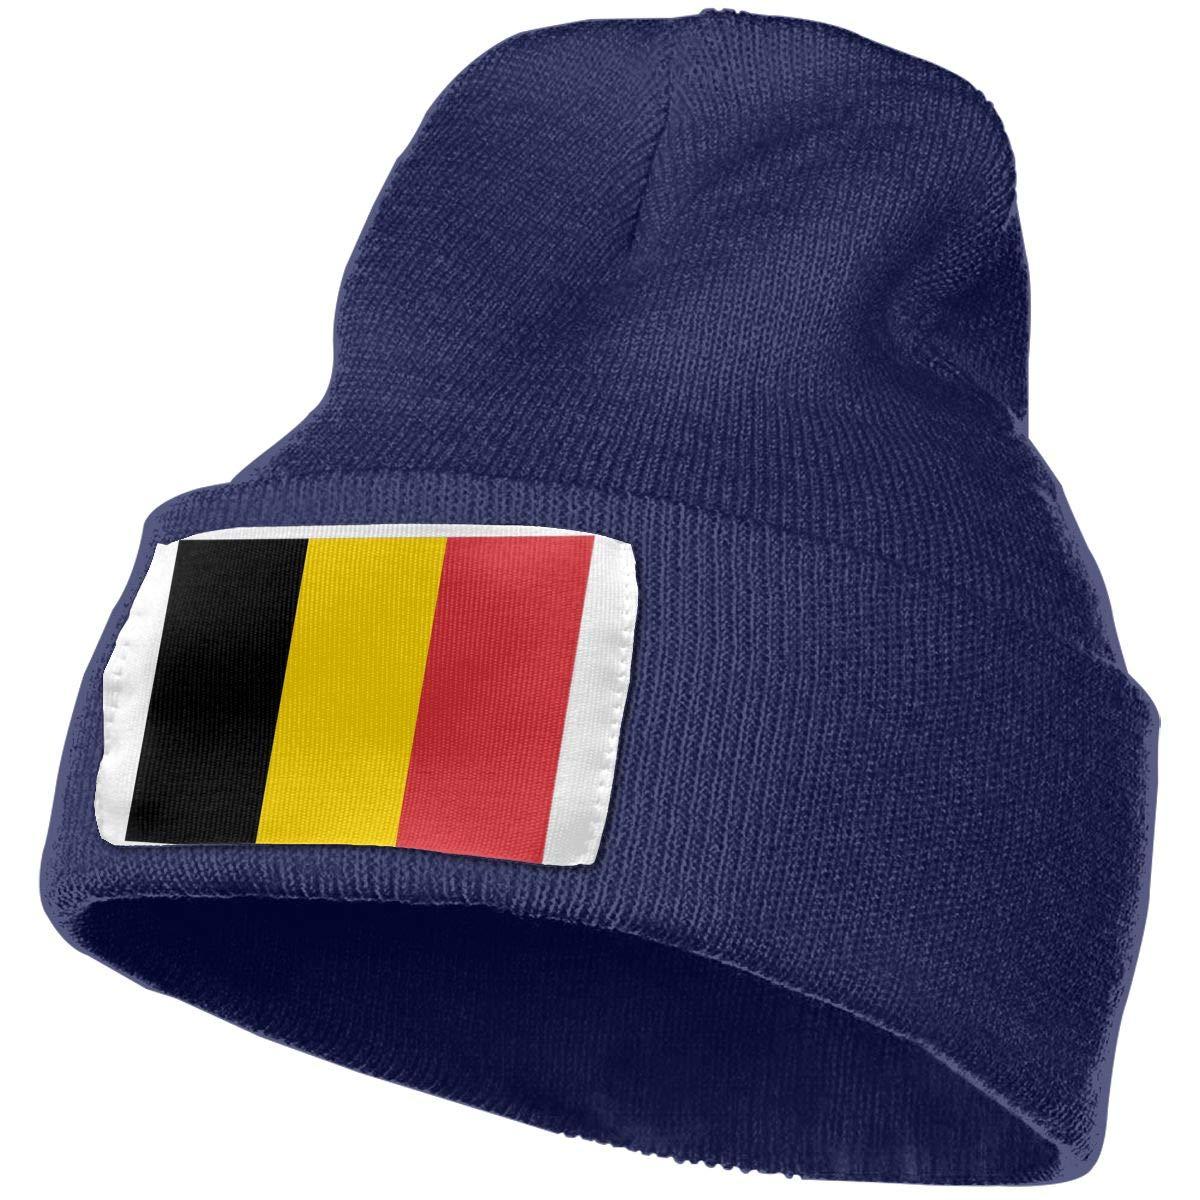 QZqDQ Flag of Belgium Unisex Fashion Knitted Hat Luxury Hip-Hop Cap